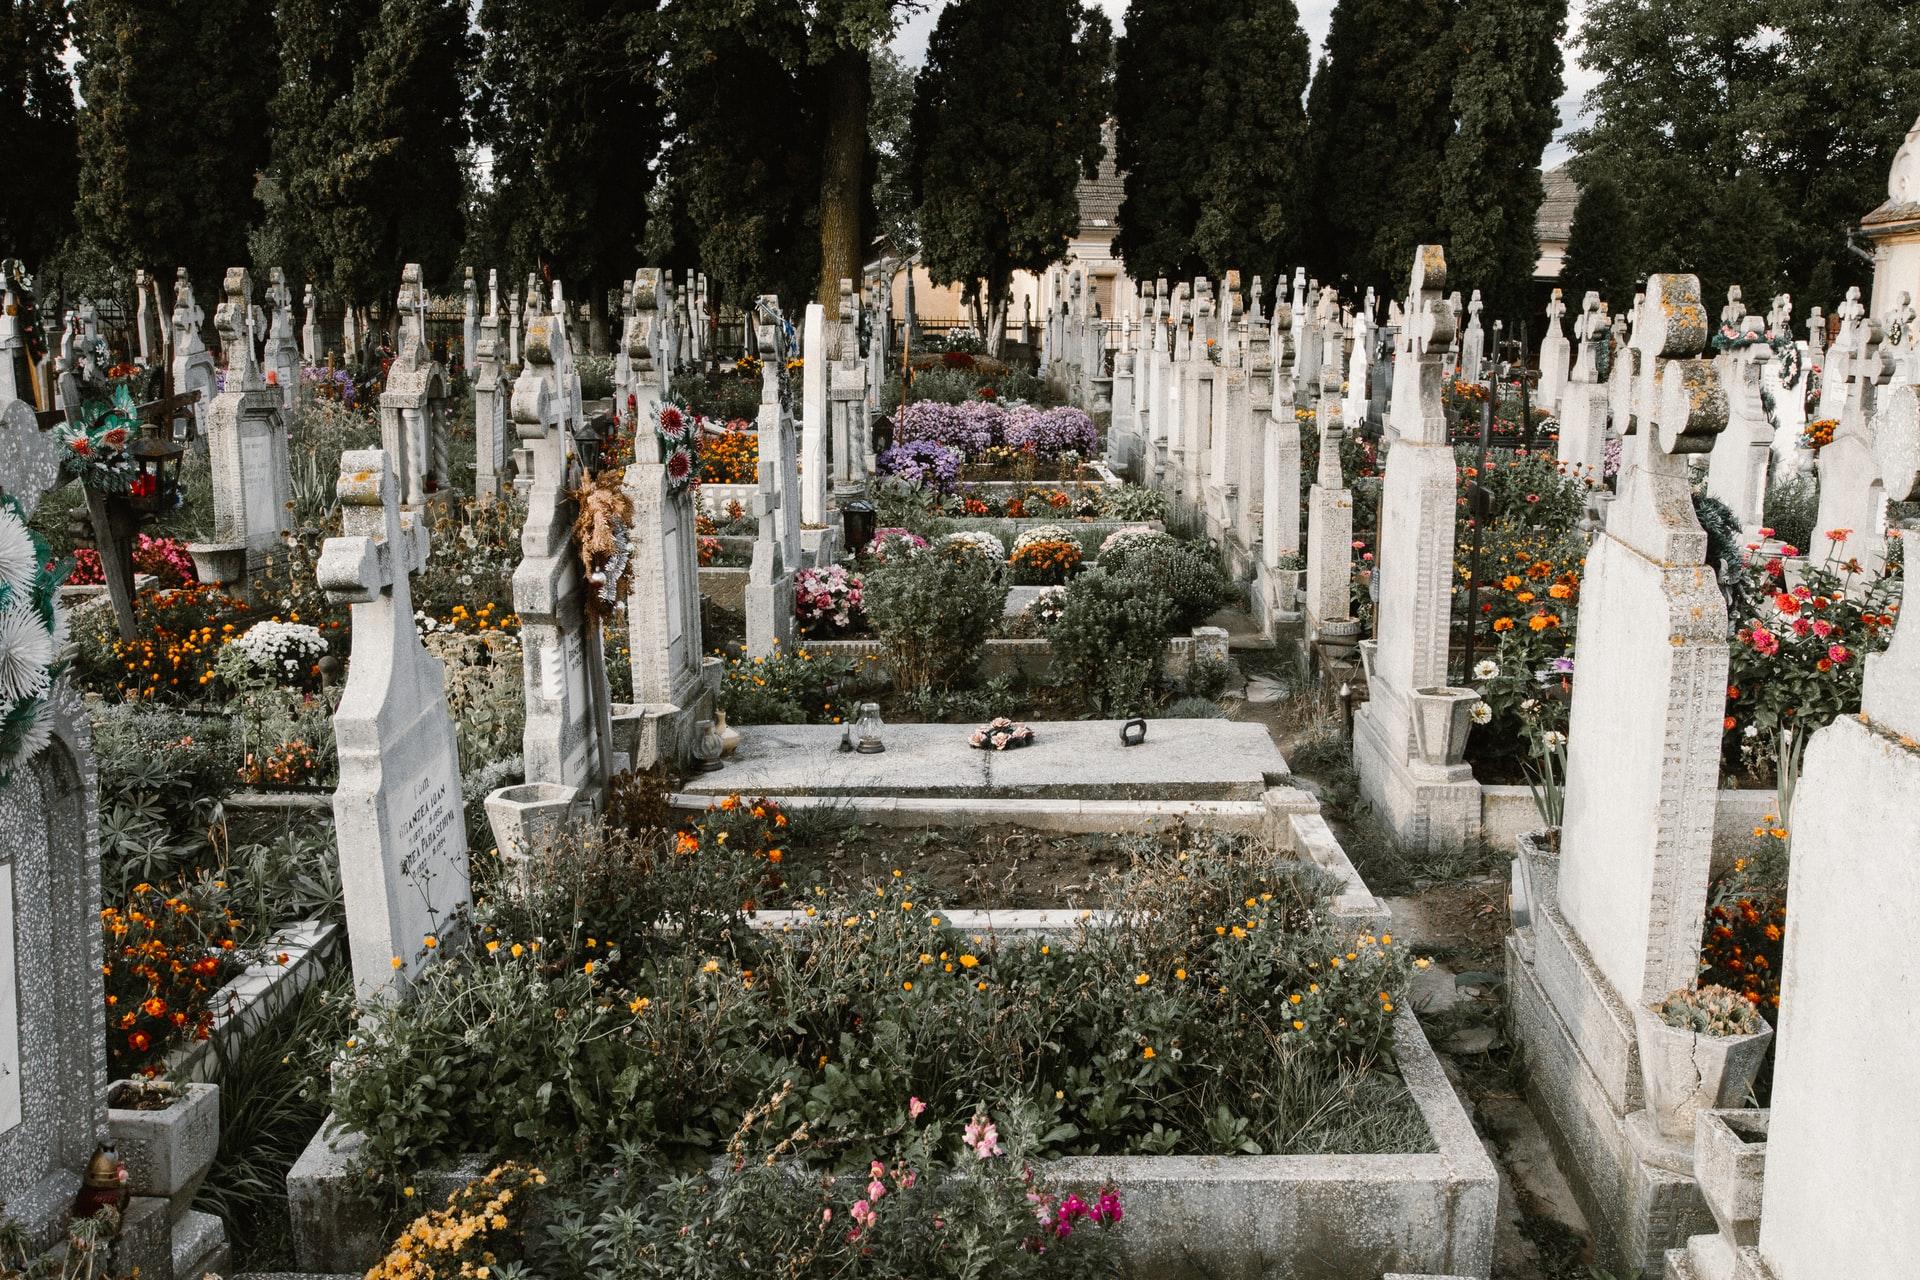 Nettoyage pierre tombale